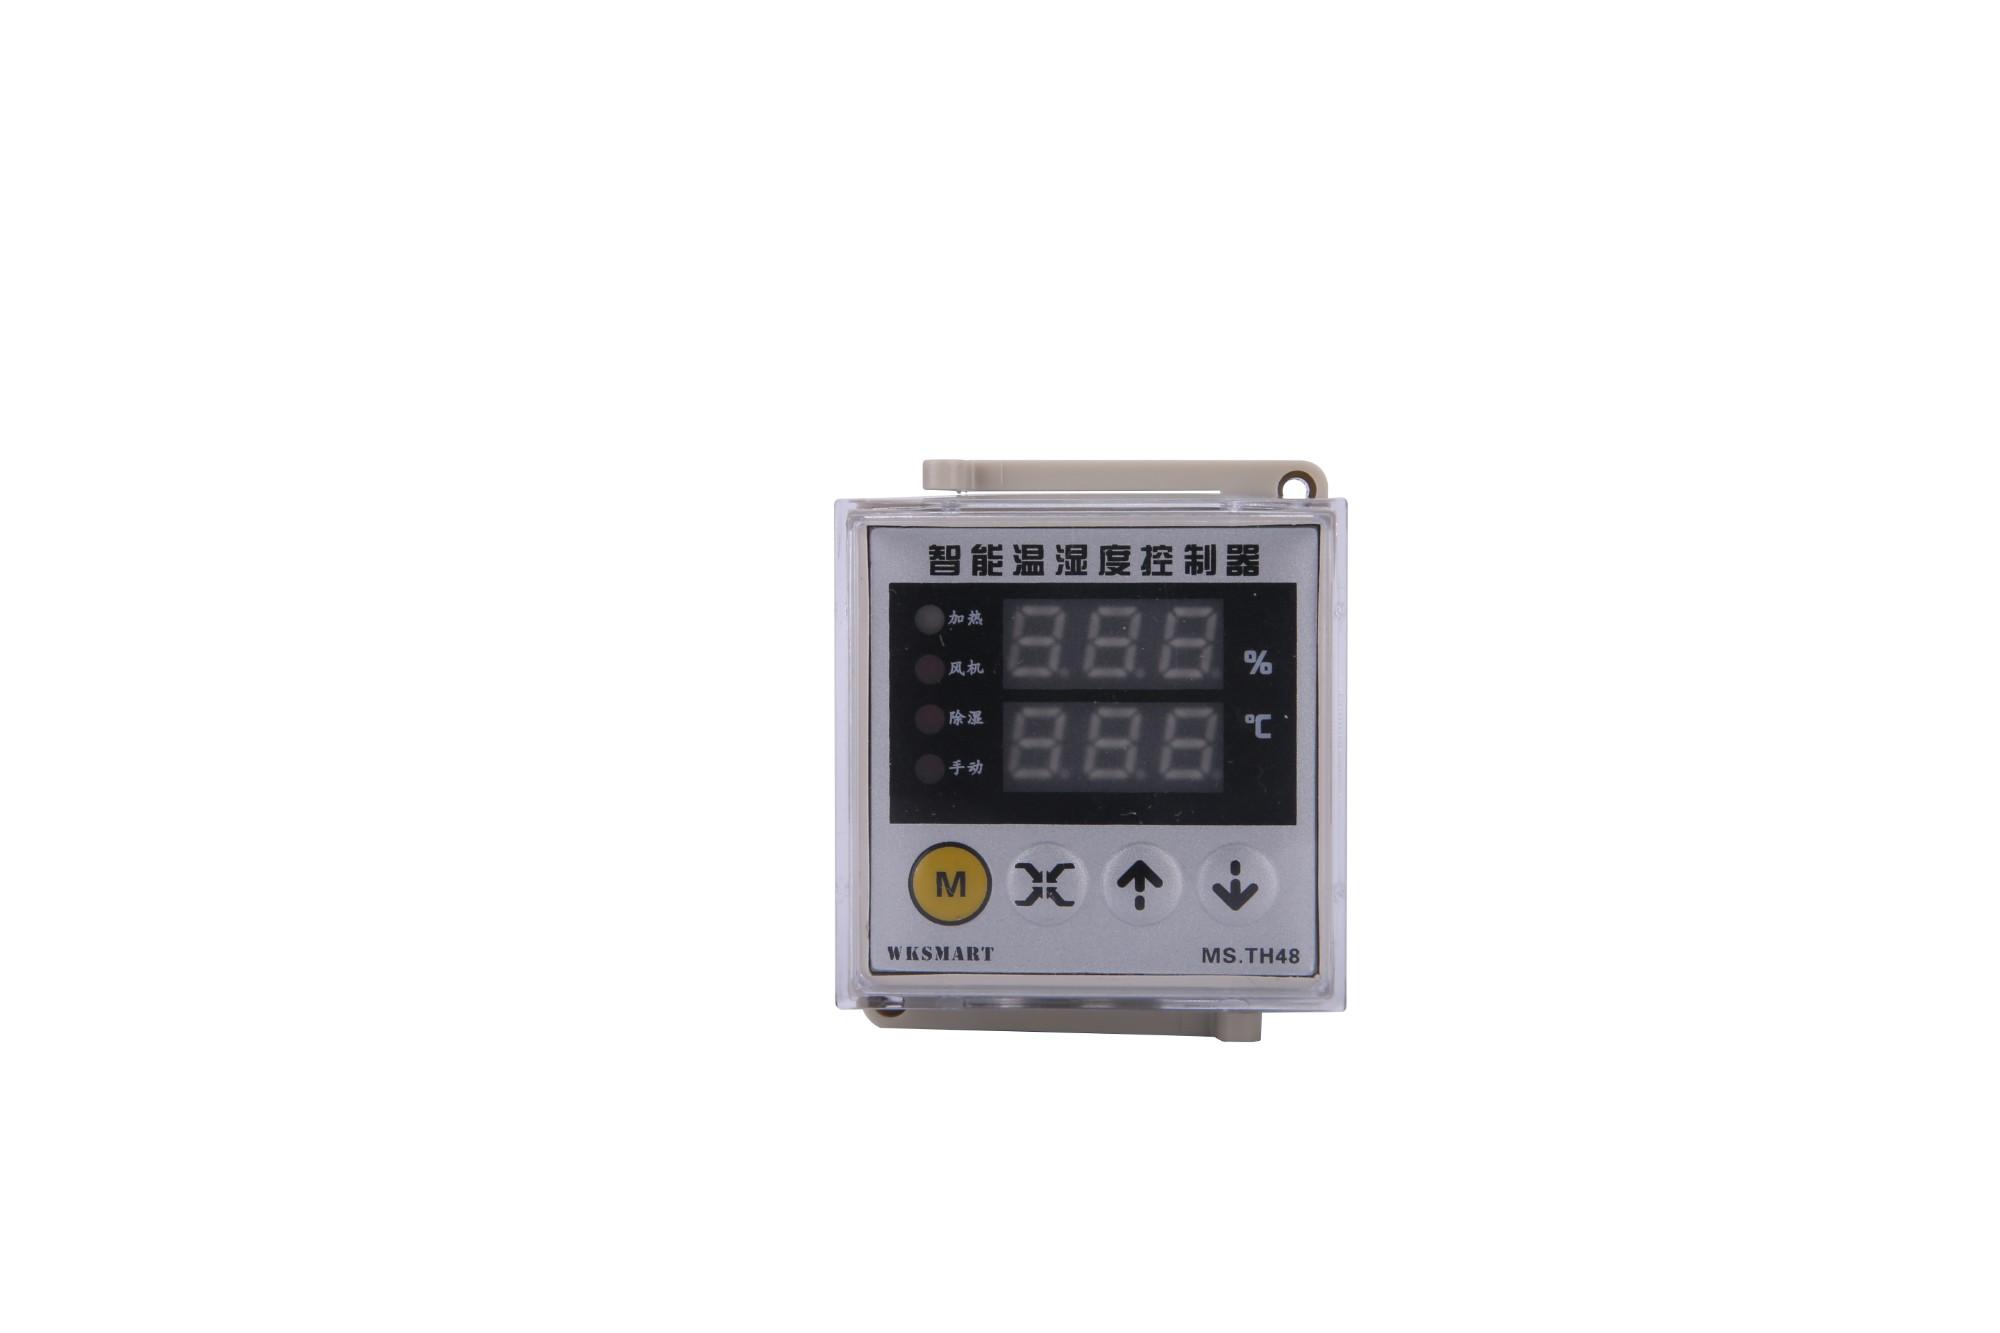 MS.TH48-100系列开关柜智能温湿度控制器